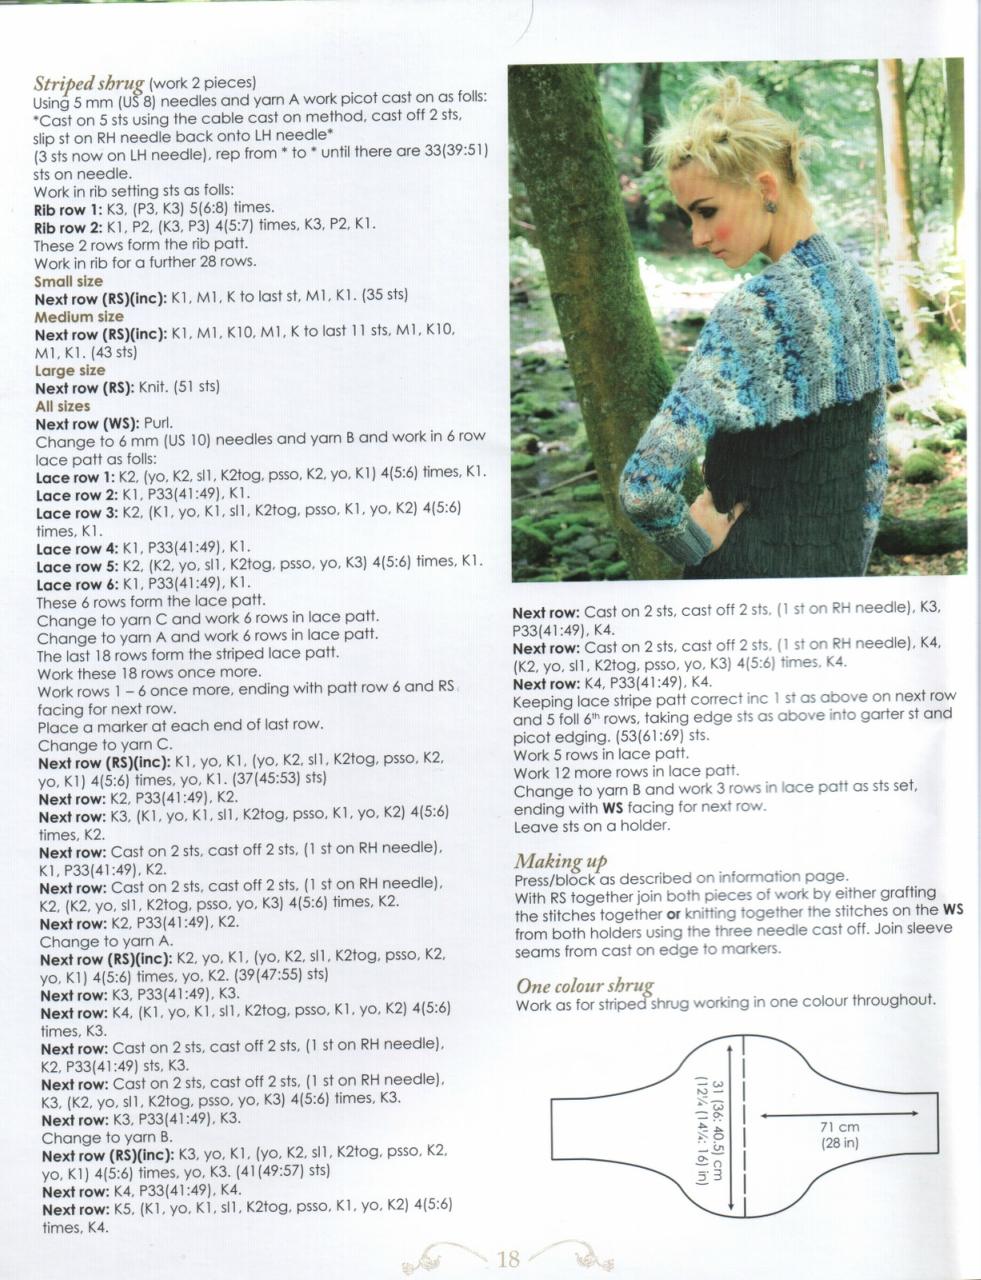 LOUISA HARDING QUEEN OF HEARTS 2009 - 编织幸福 - 编织幸福的博客